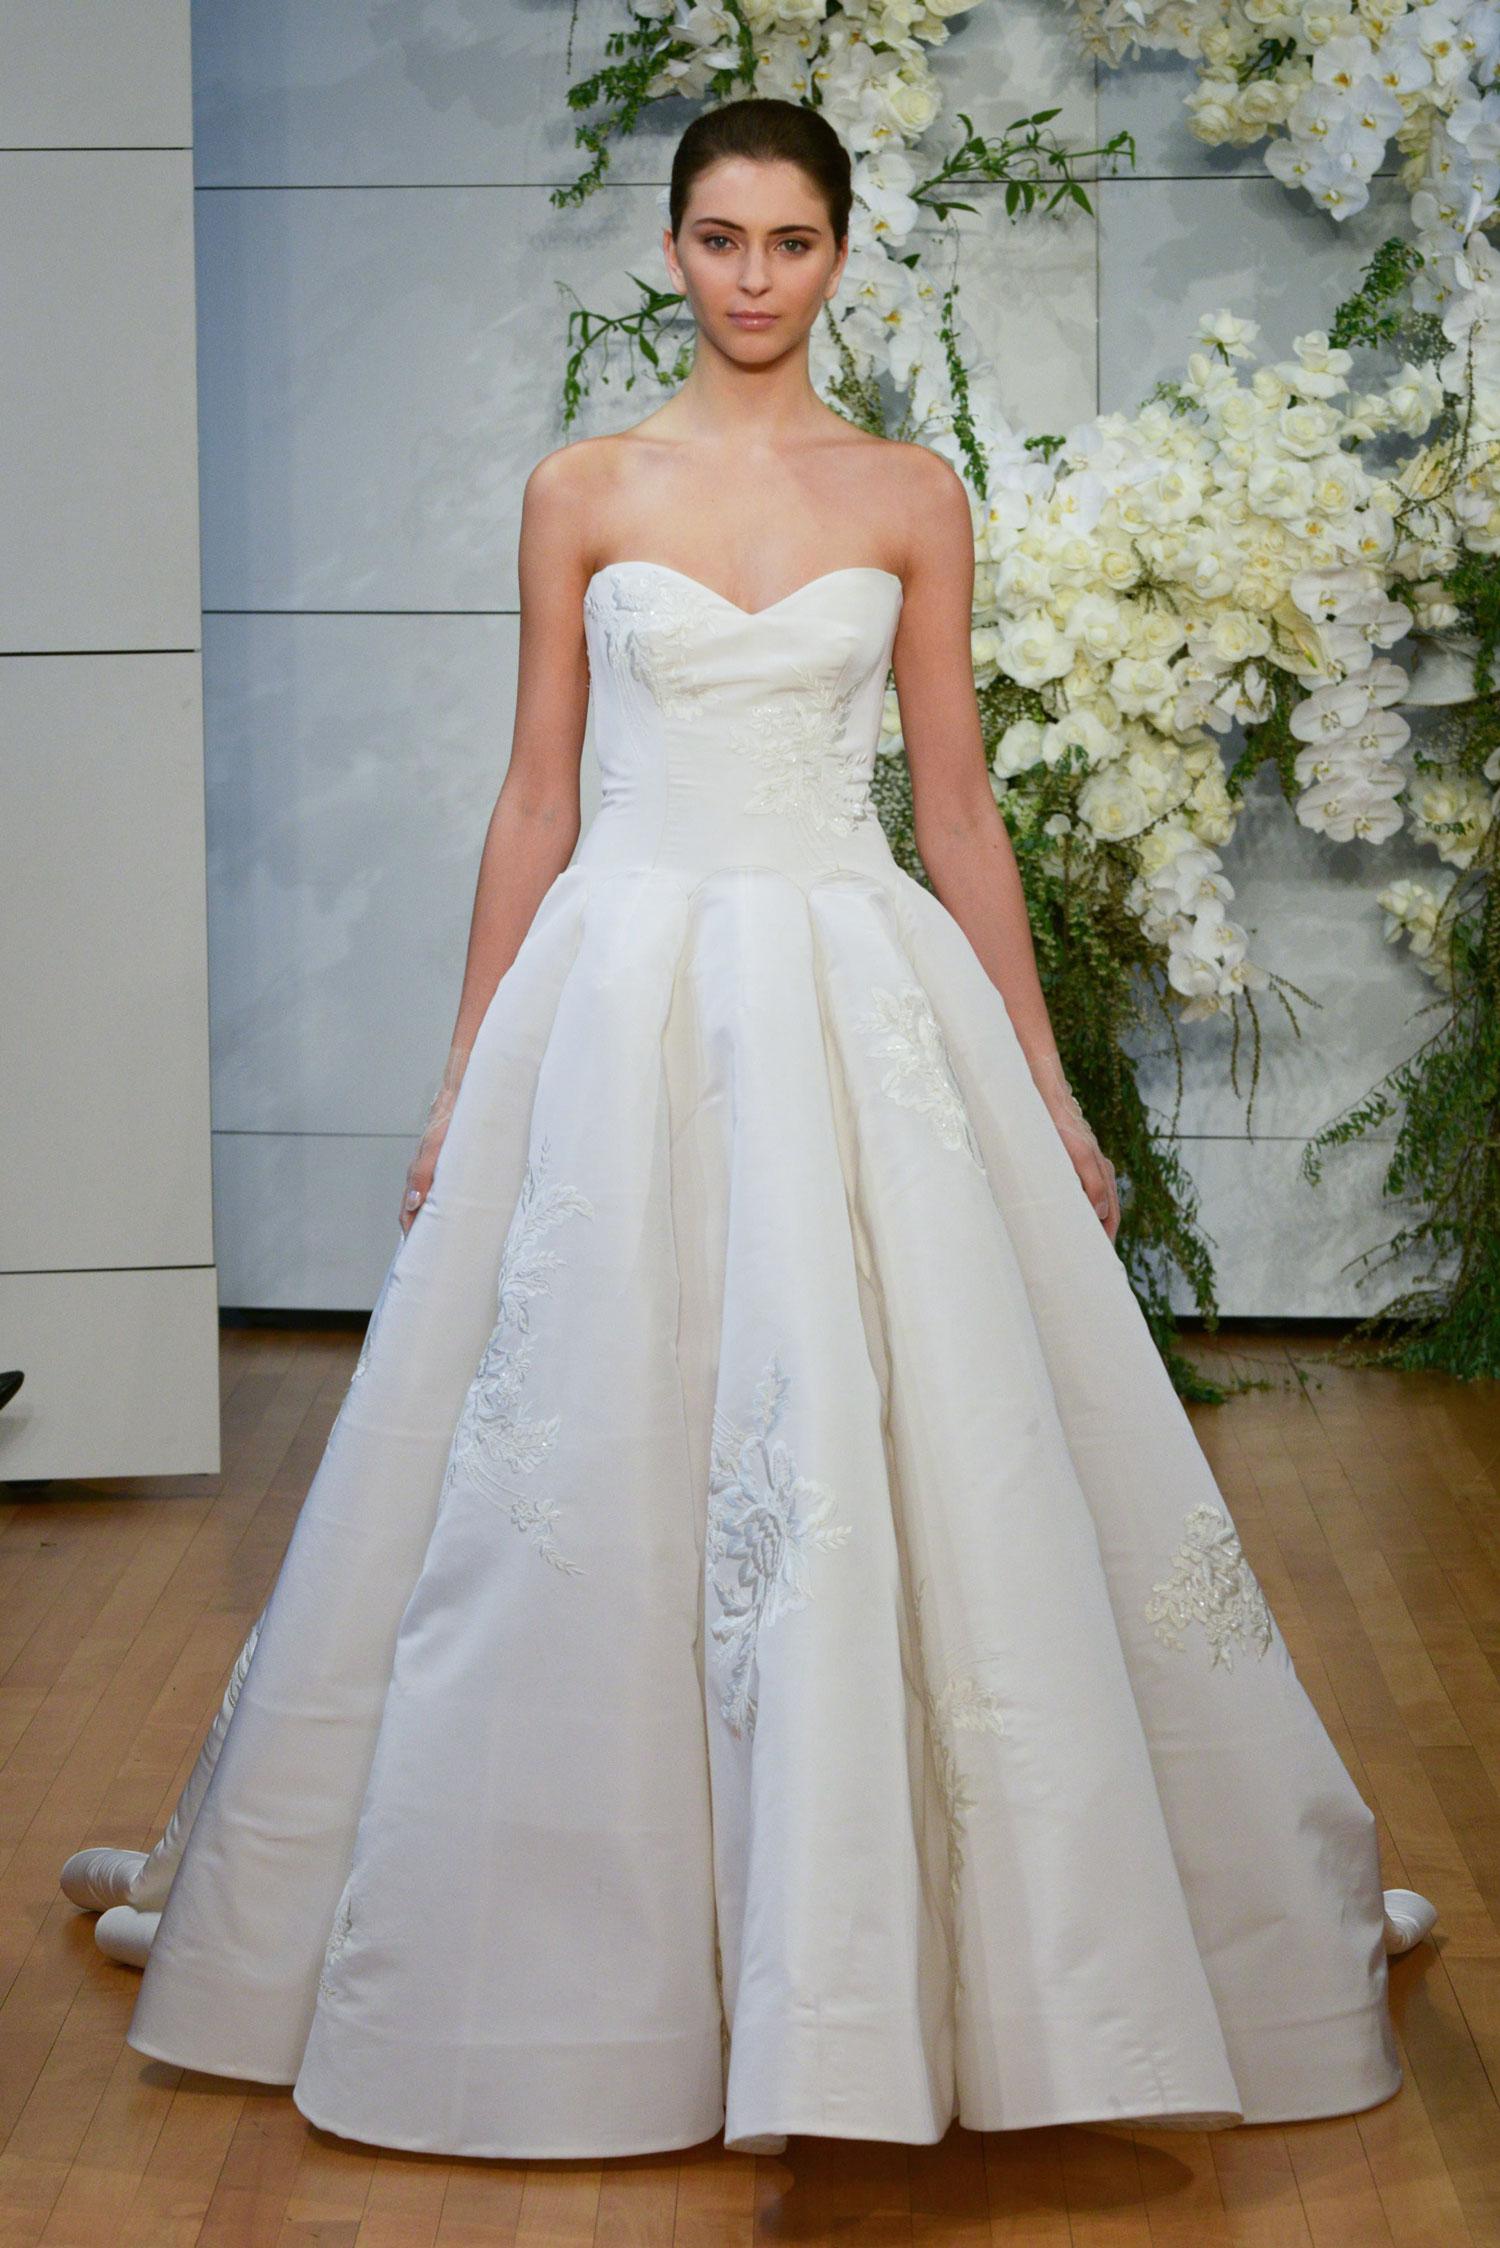 Monique Lhuillier Spring 2018 Juliette - Inside Weddings